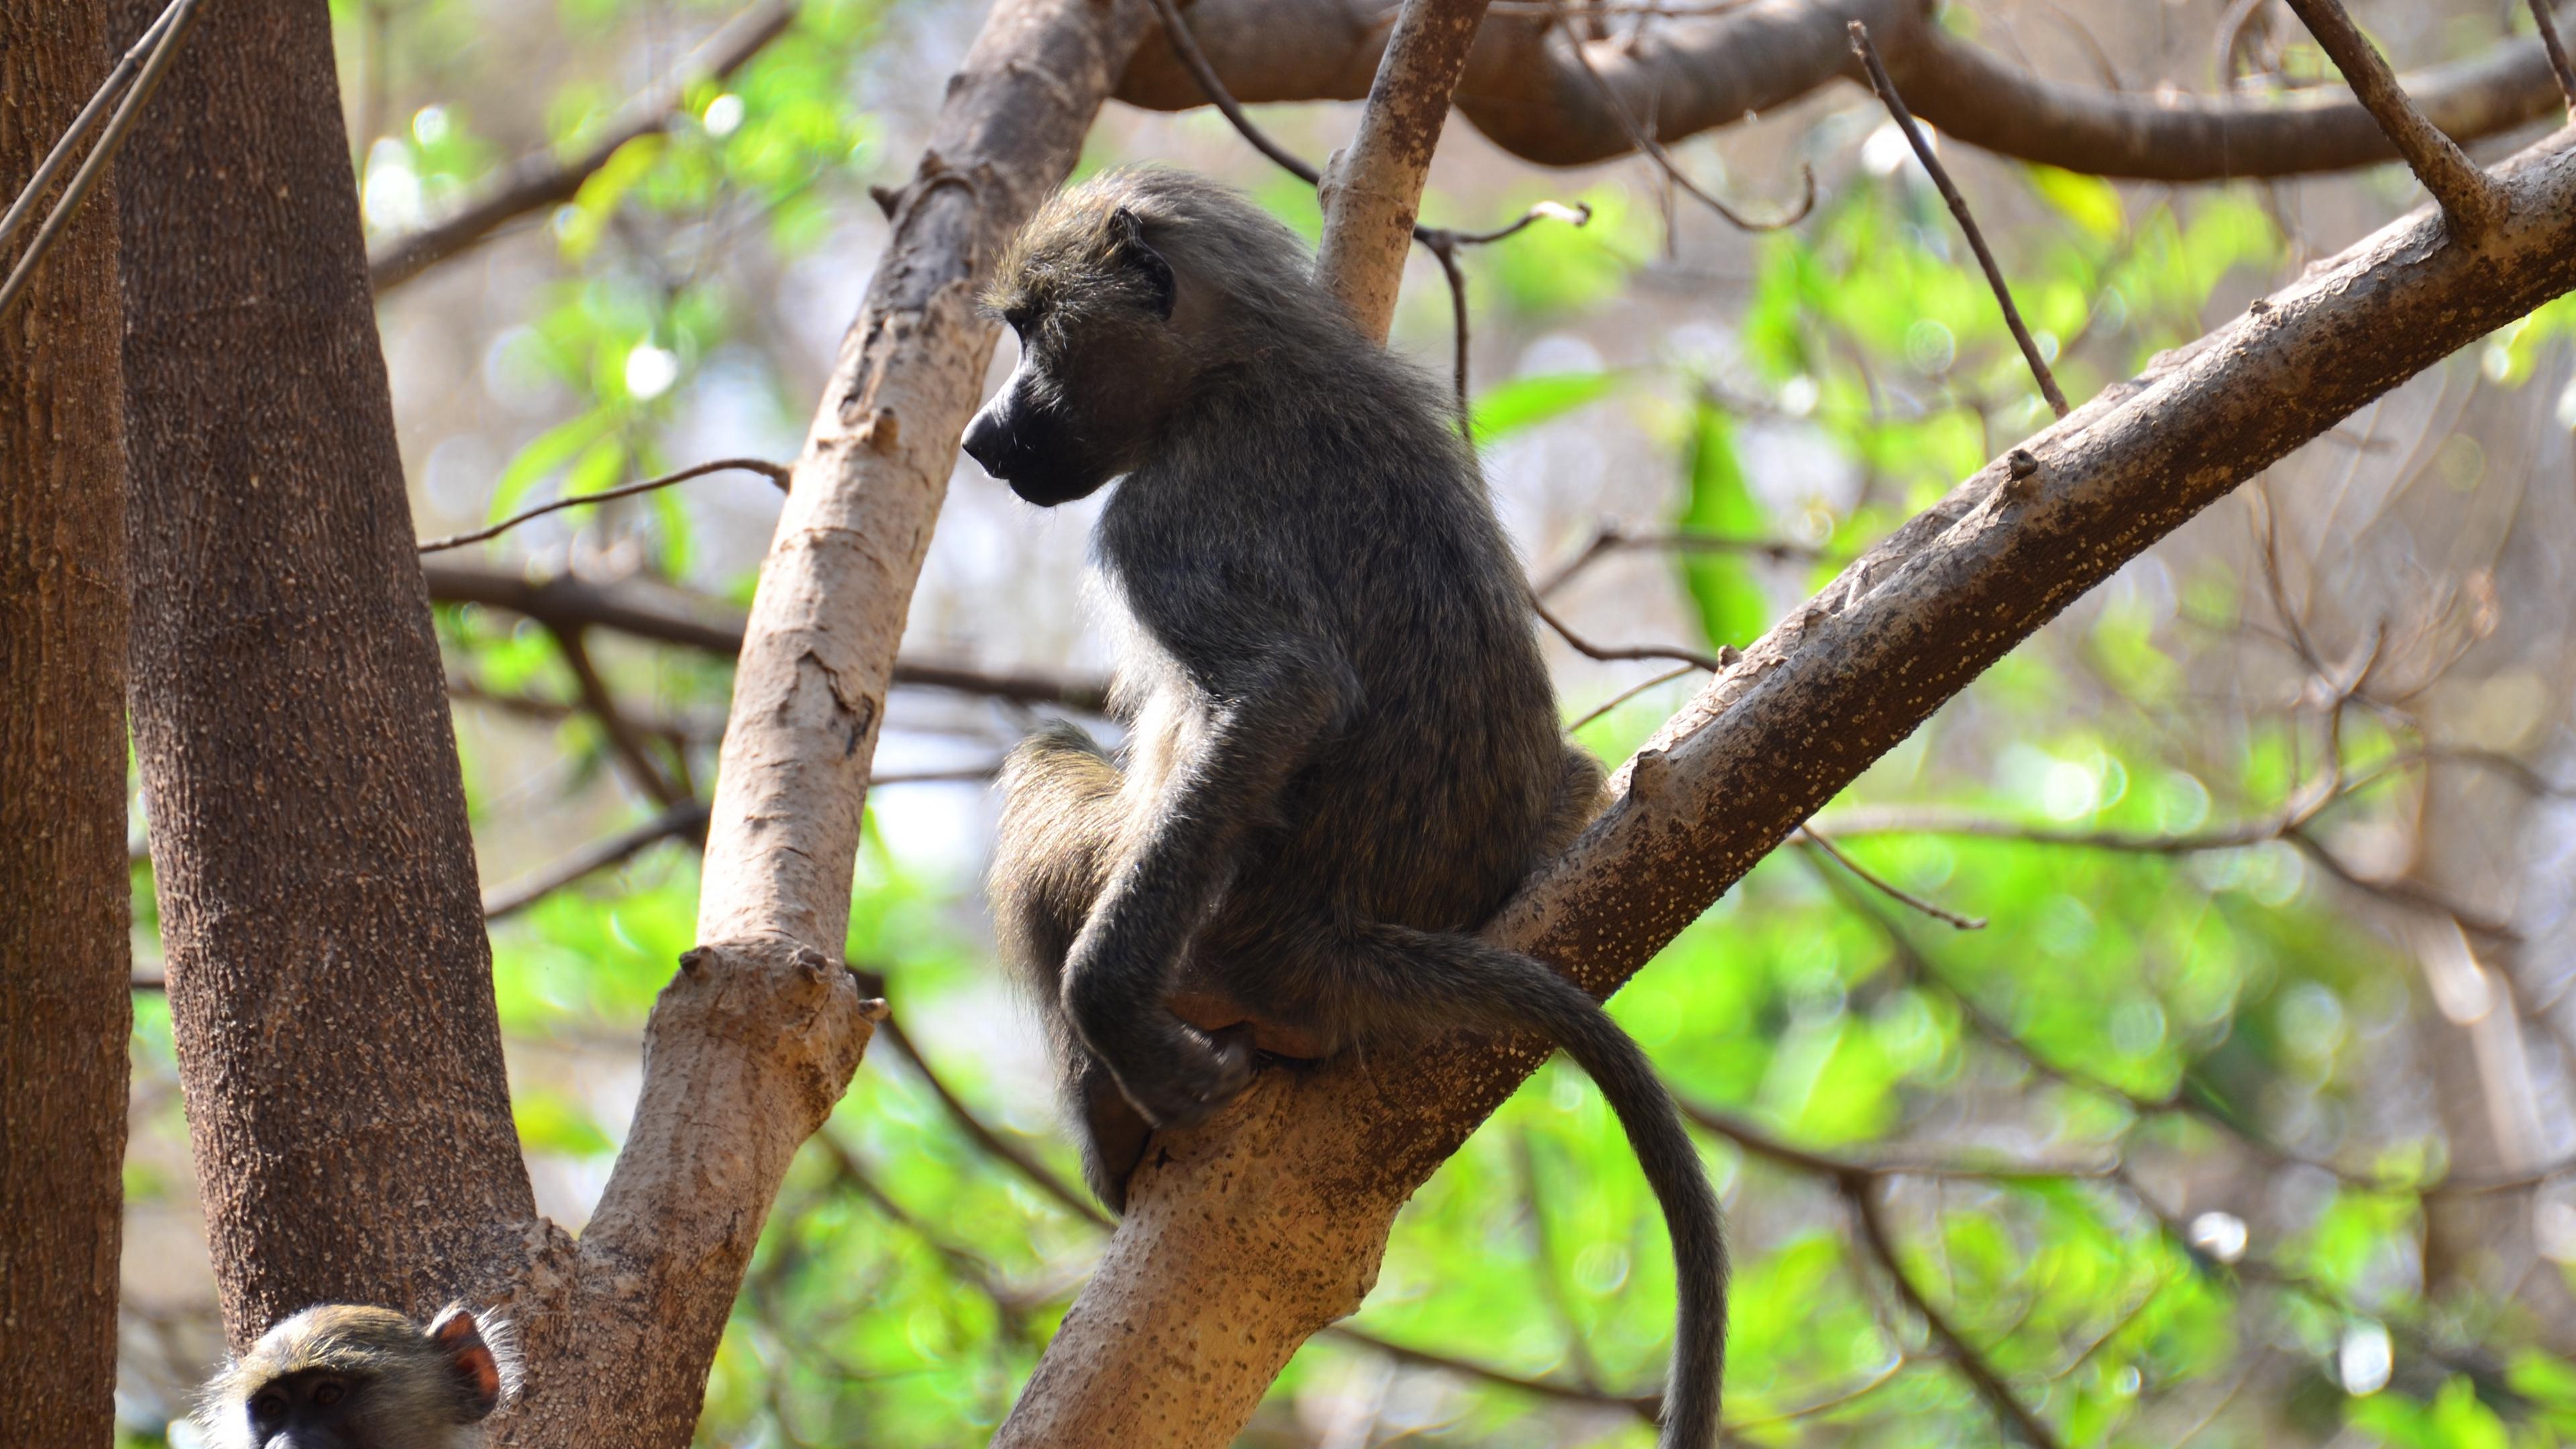 monkey branch sitting 4k 1542242593 - monkey, branch, sitting 4k - Sitting, Monkey, branch